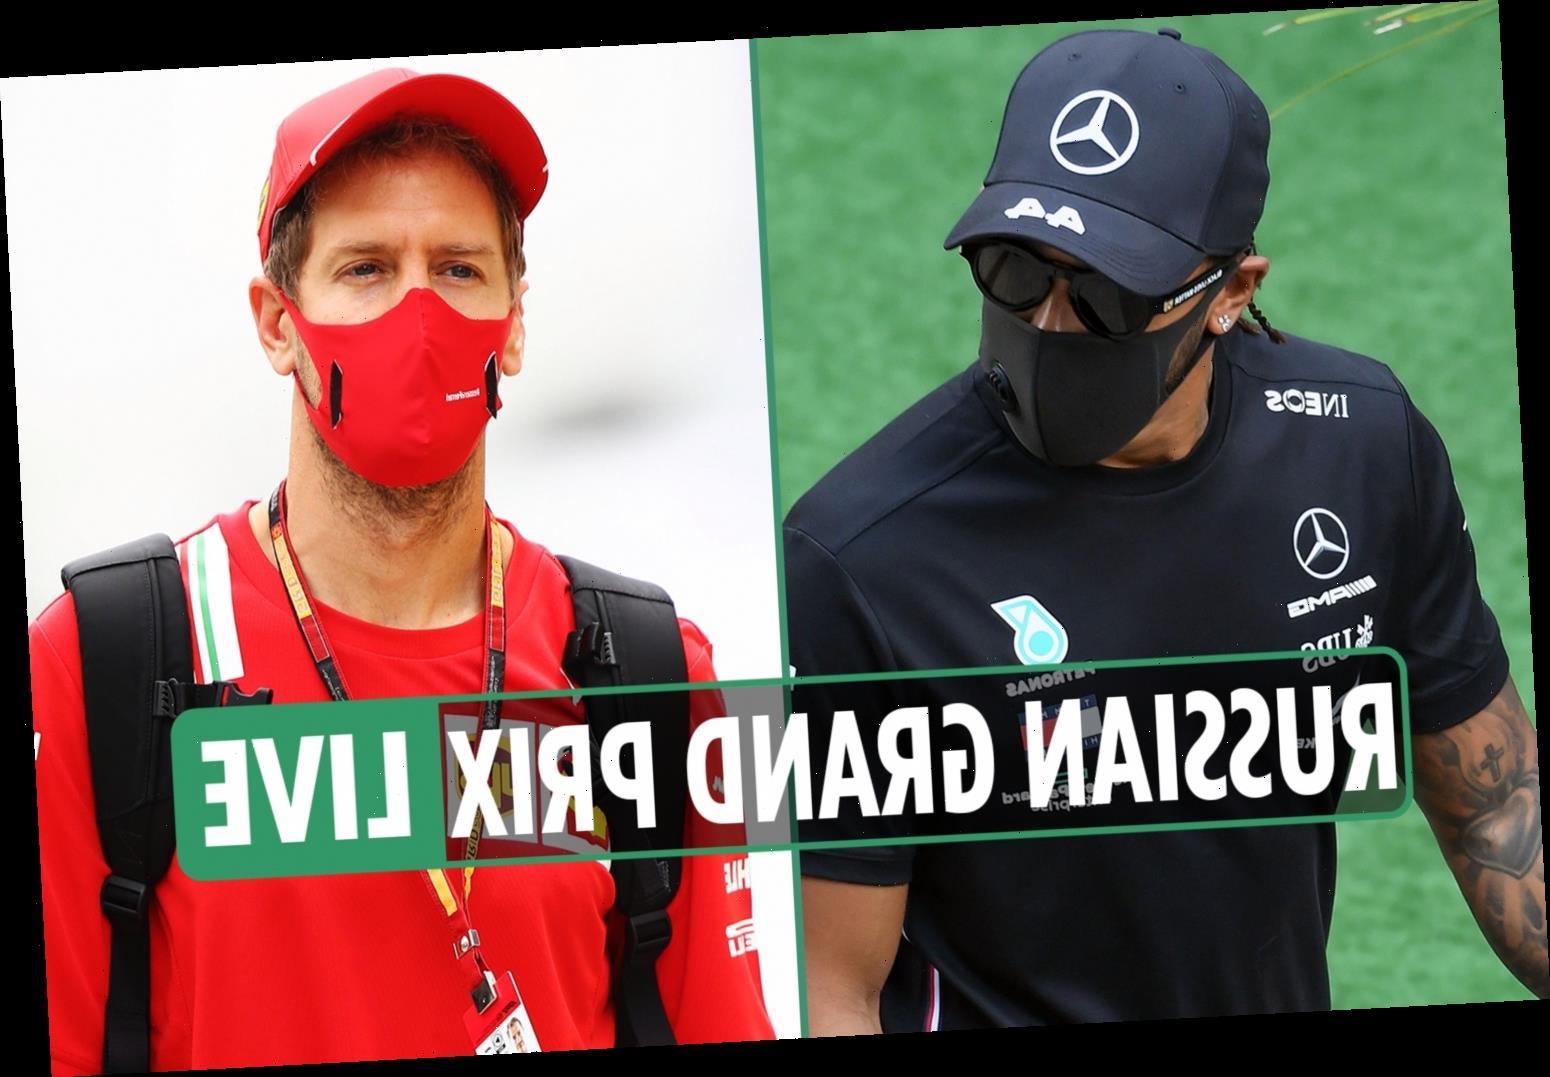 F1 Russian Grand Prix 2020 LIVE: Hamilton POLE ahead of Verstappen and Bottas – latest updates – The Sun